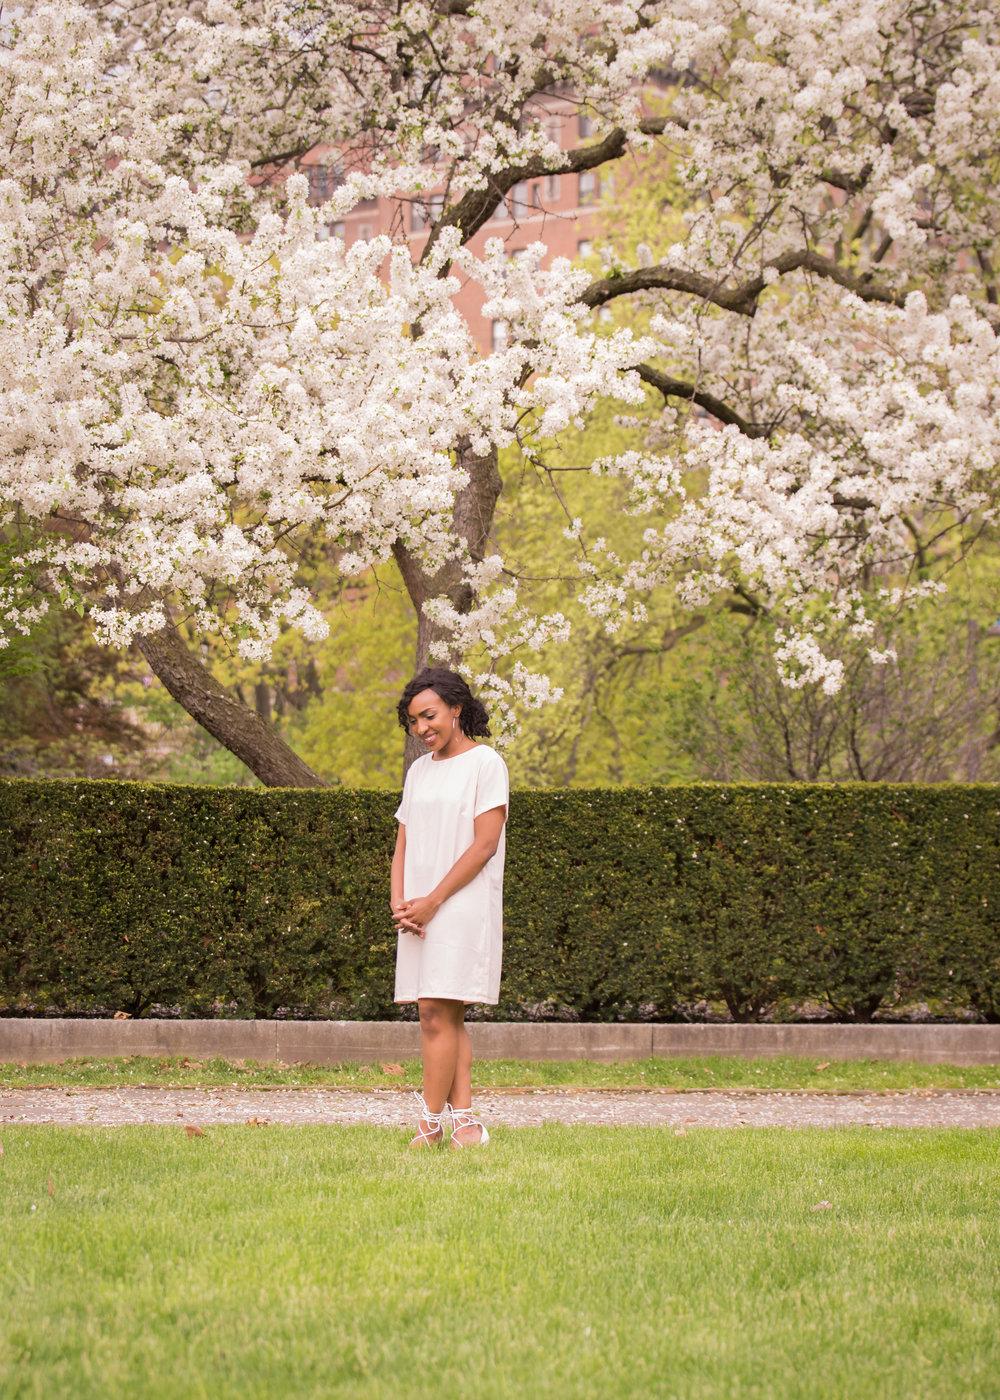 Blog   Cleveland based photographer focusing on baby/child, family ...